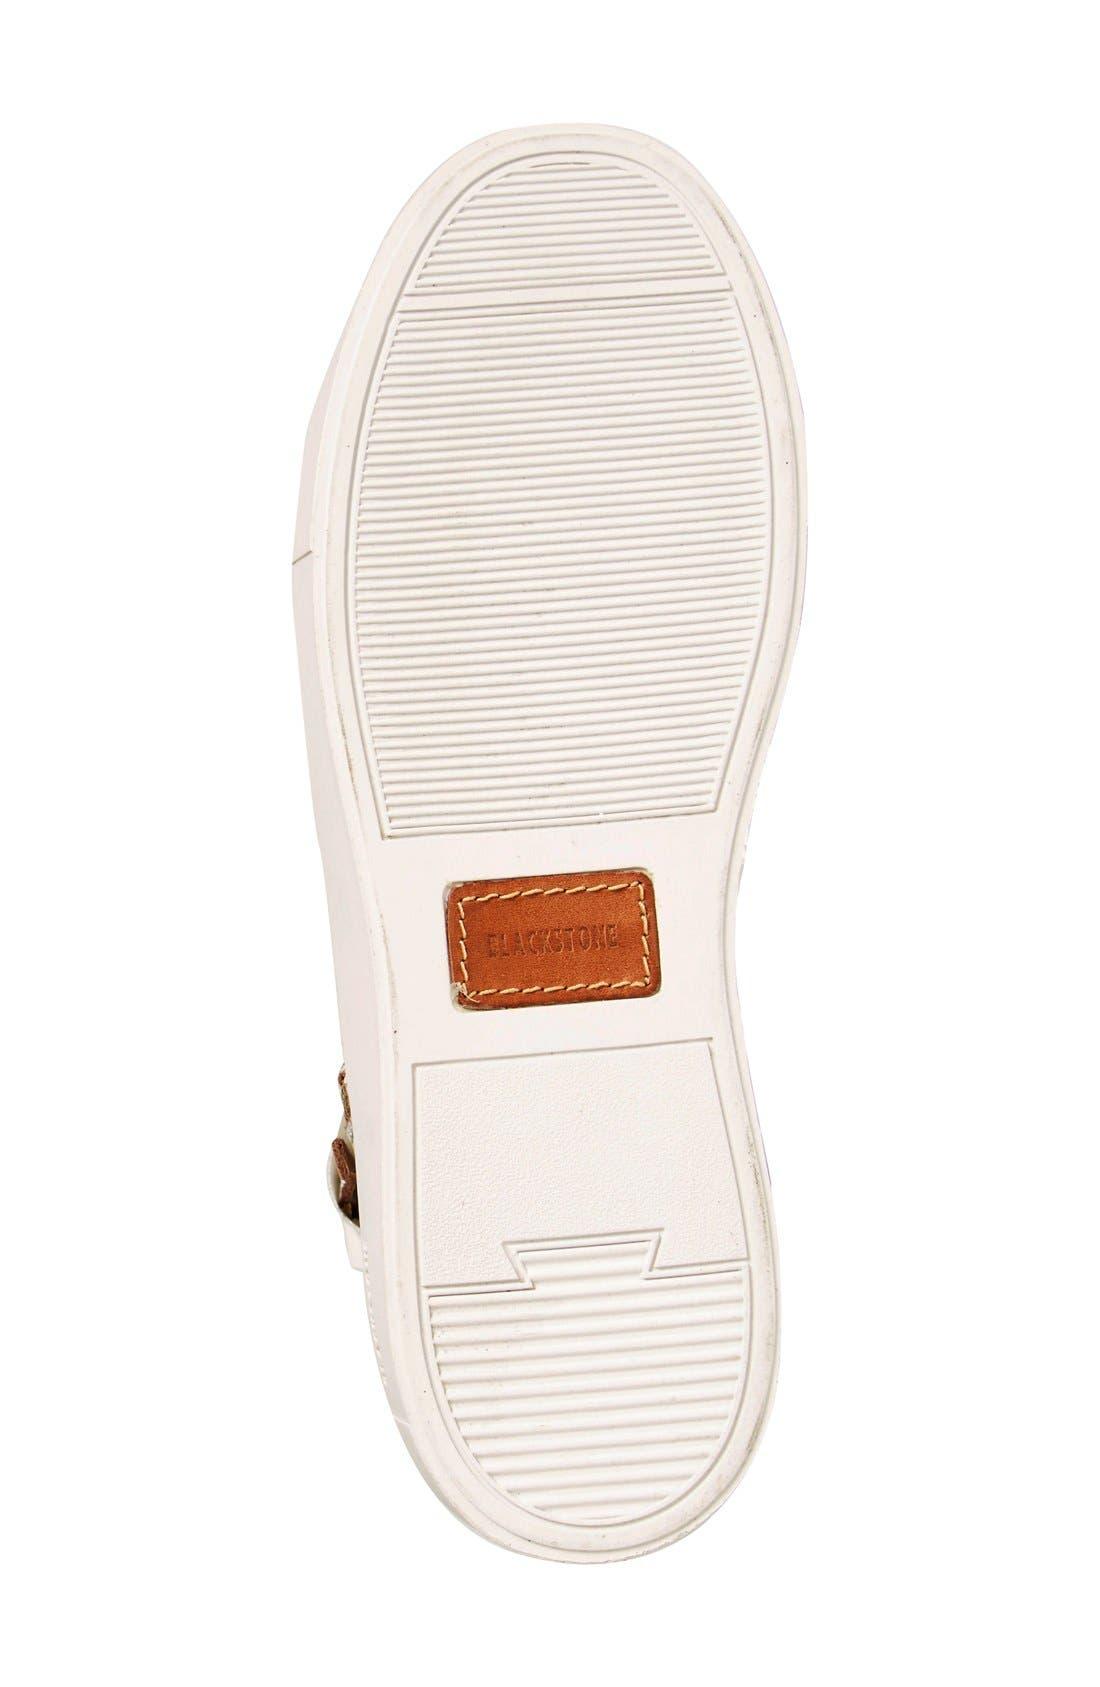 'LL78' Crackled High Top Platform Sneaker,                             Alternate thumbnail 4, color,                             Hazel/White